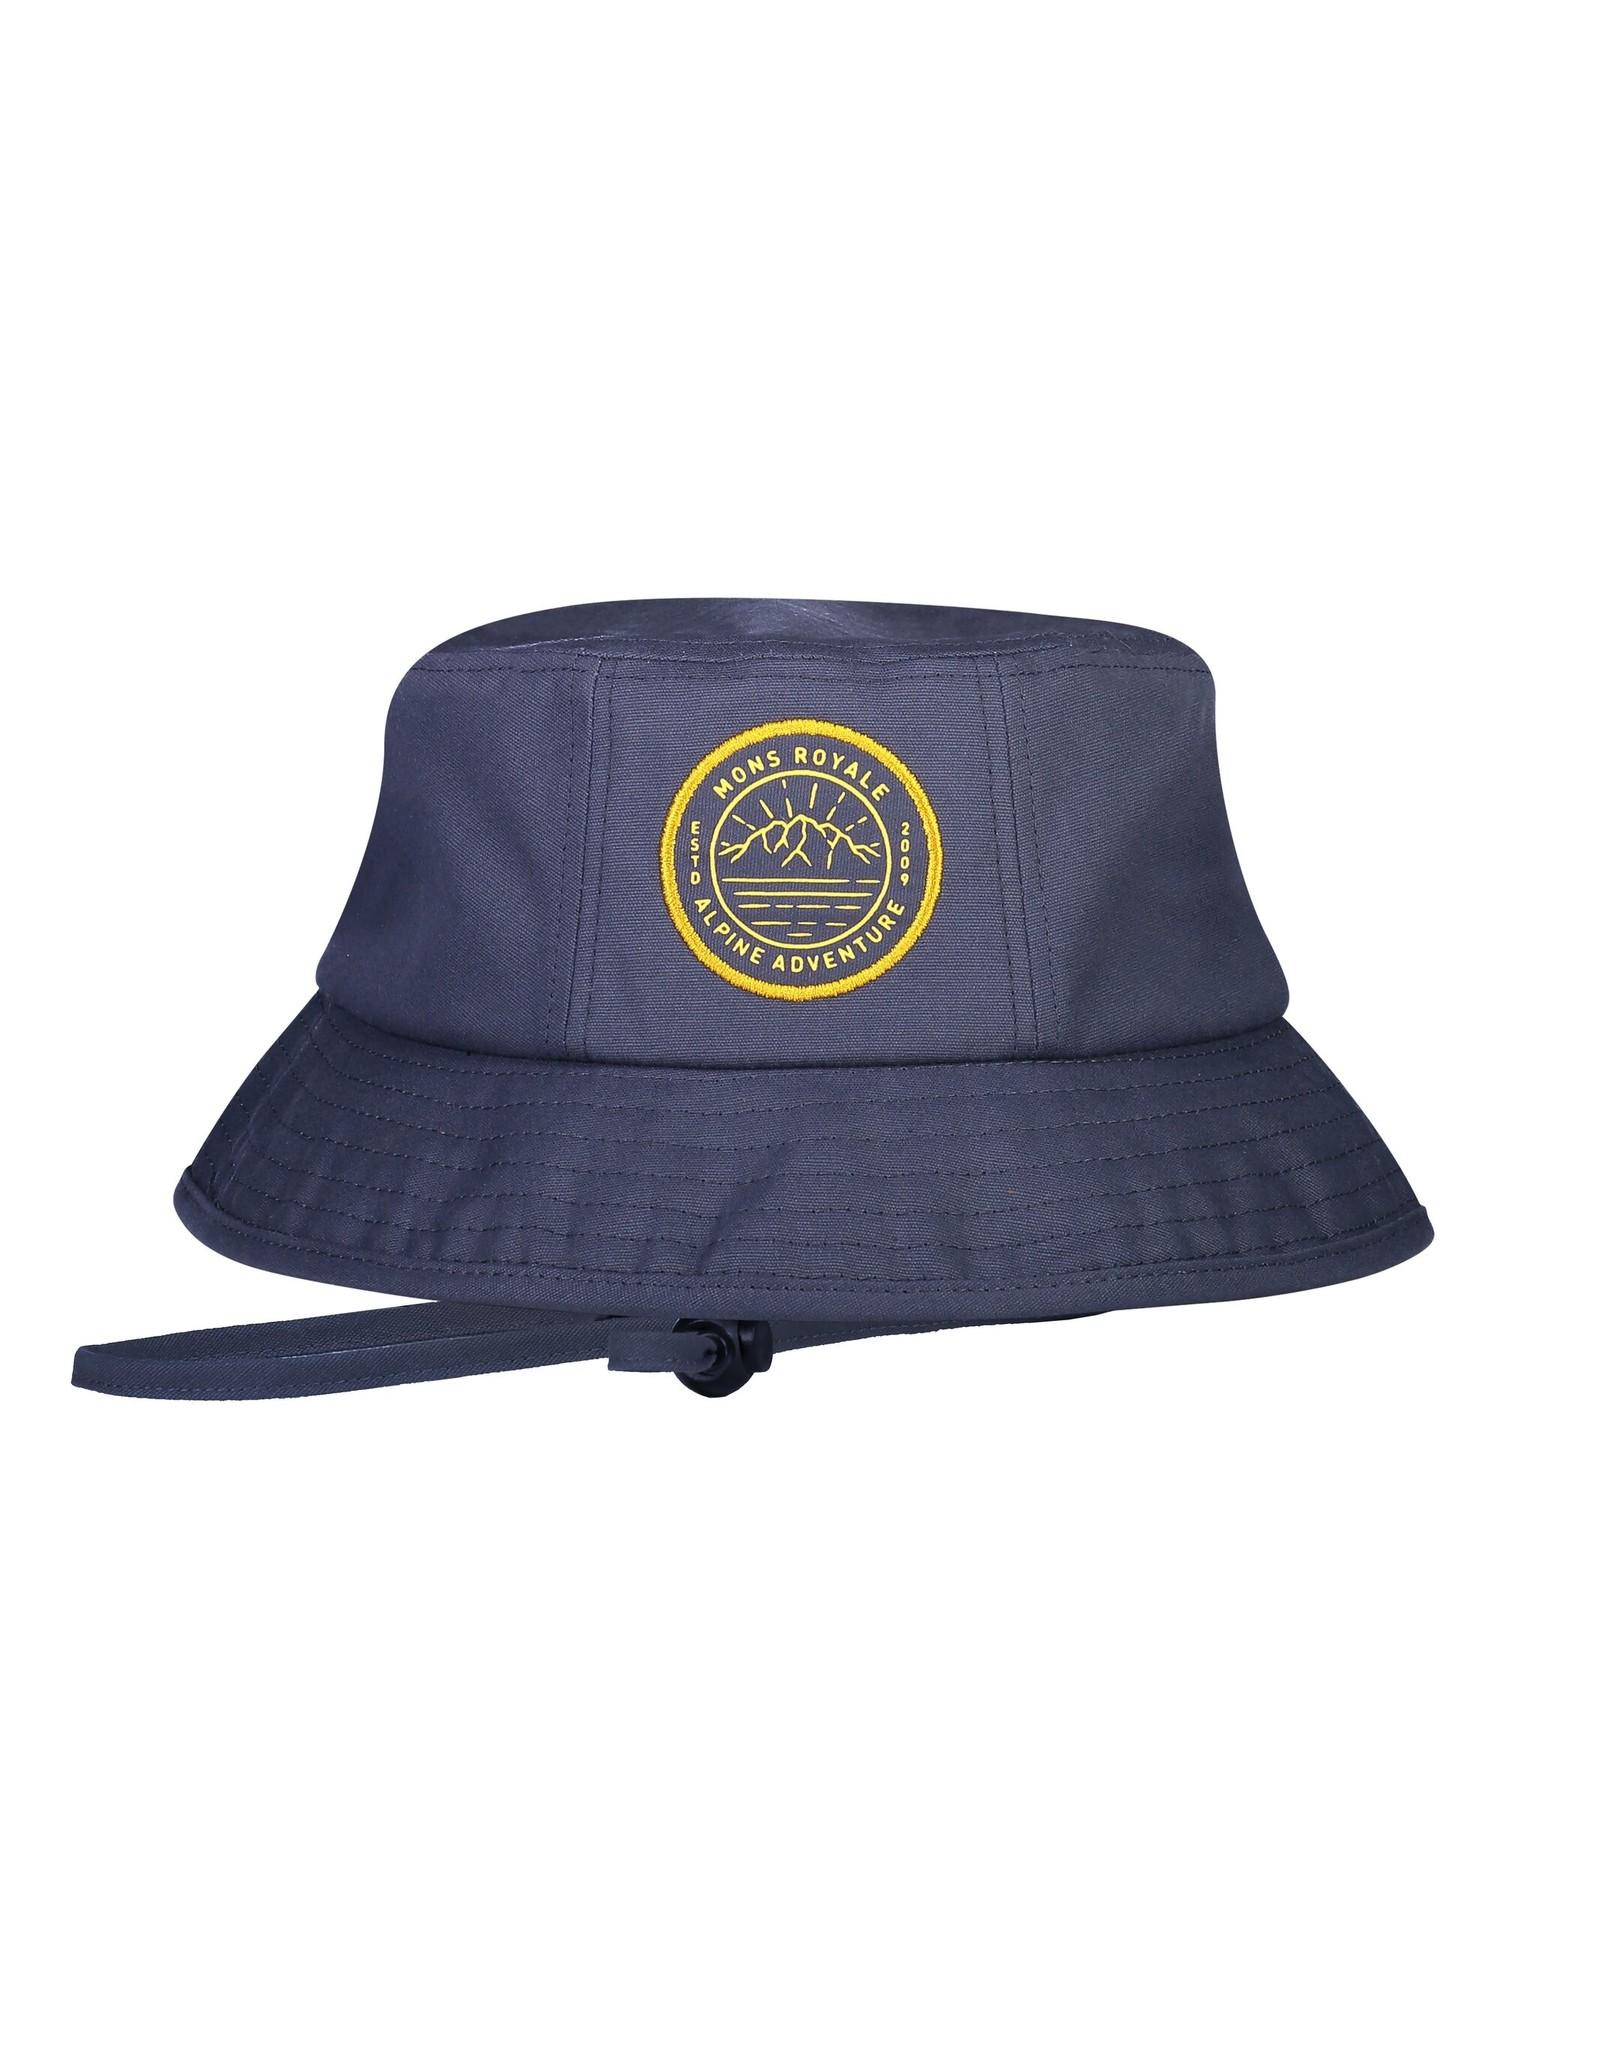 Mons Royale Mons Royale Beattie Bucket Hat - S2020